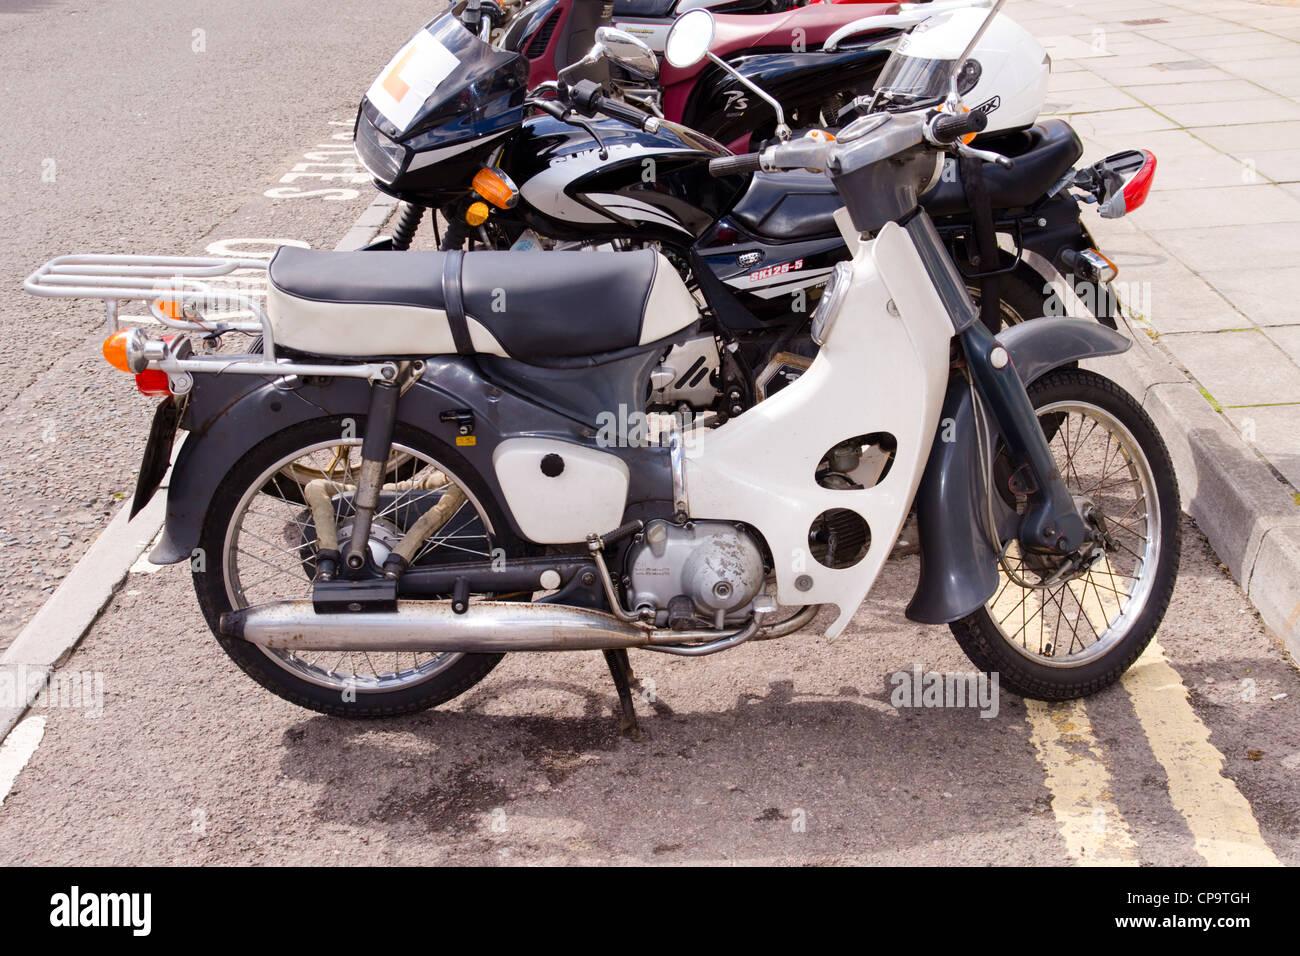 honda cub c90 motorcycle stock photo, royalty free image: 48160017